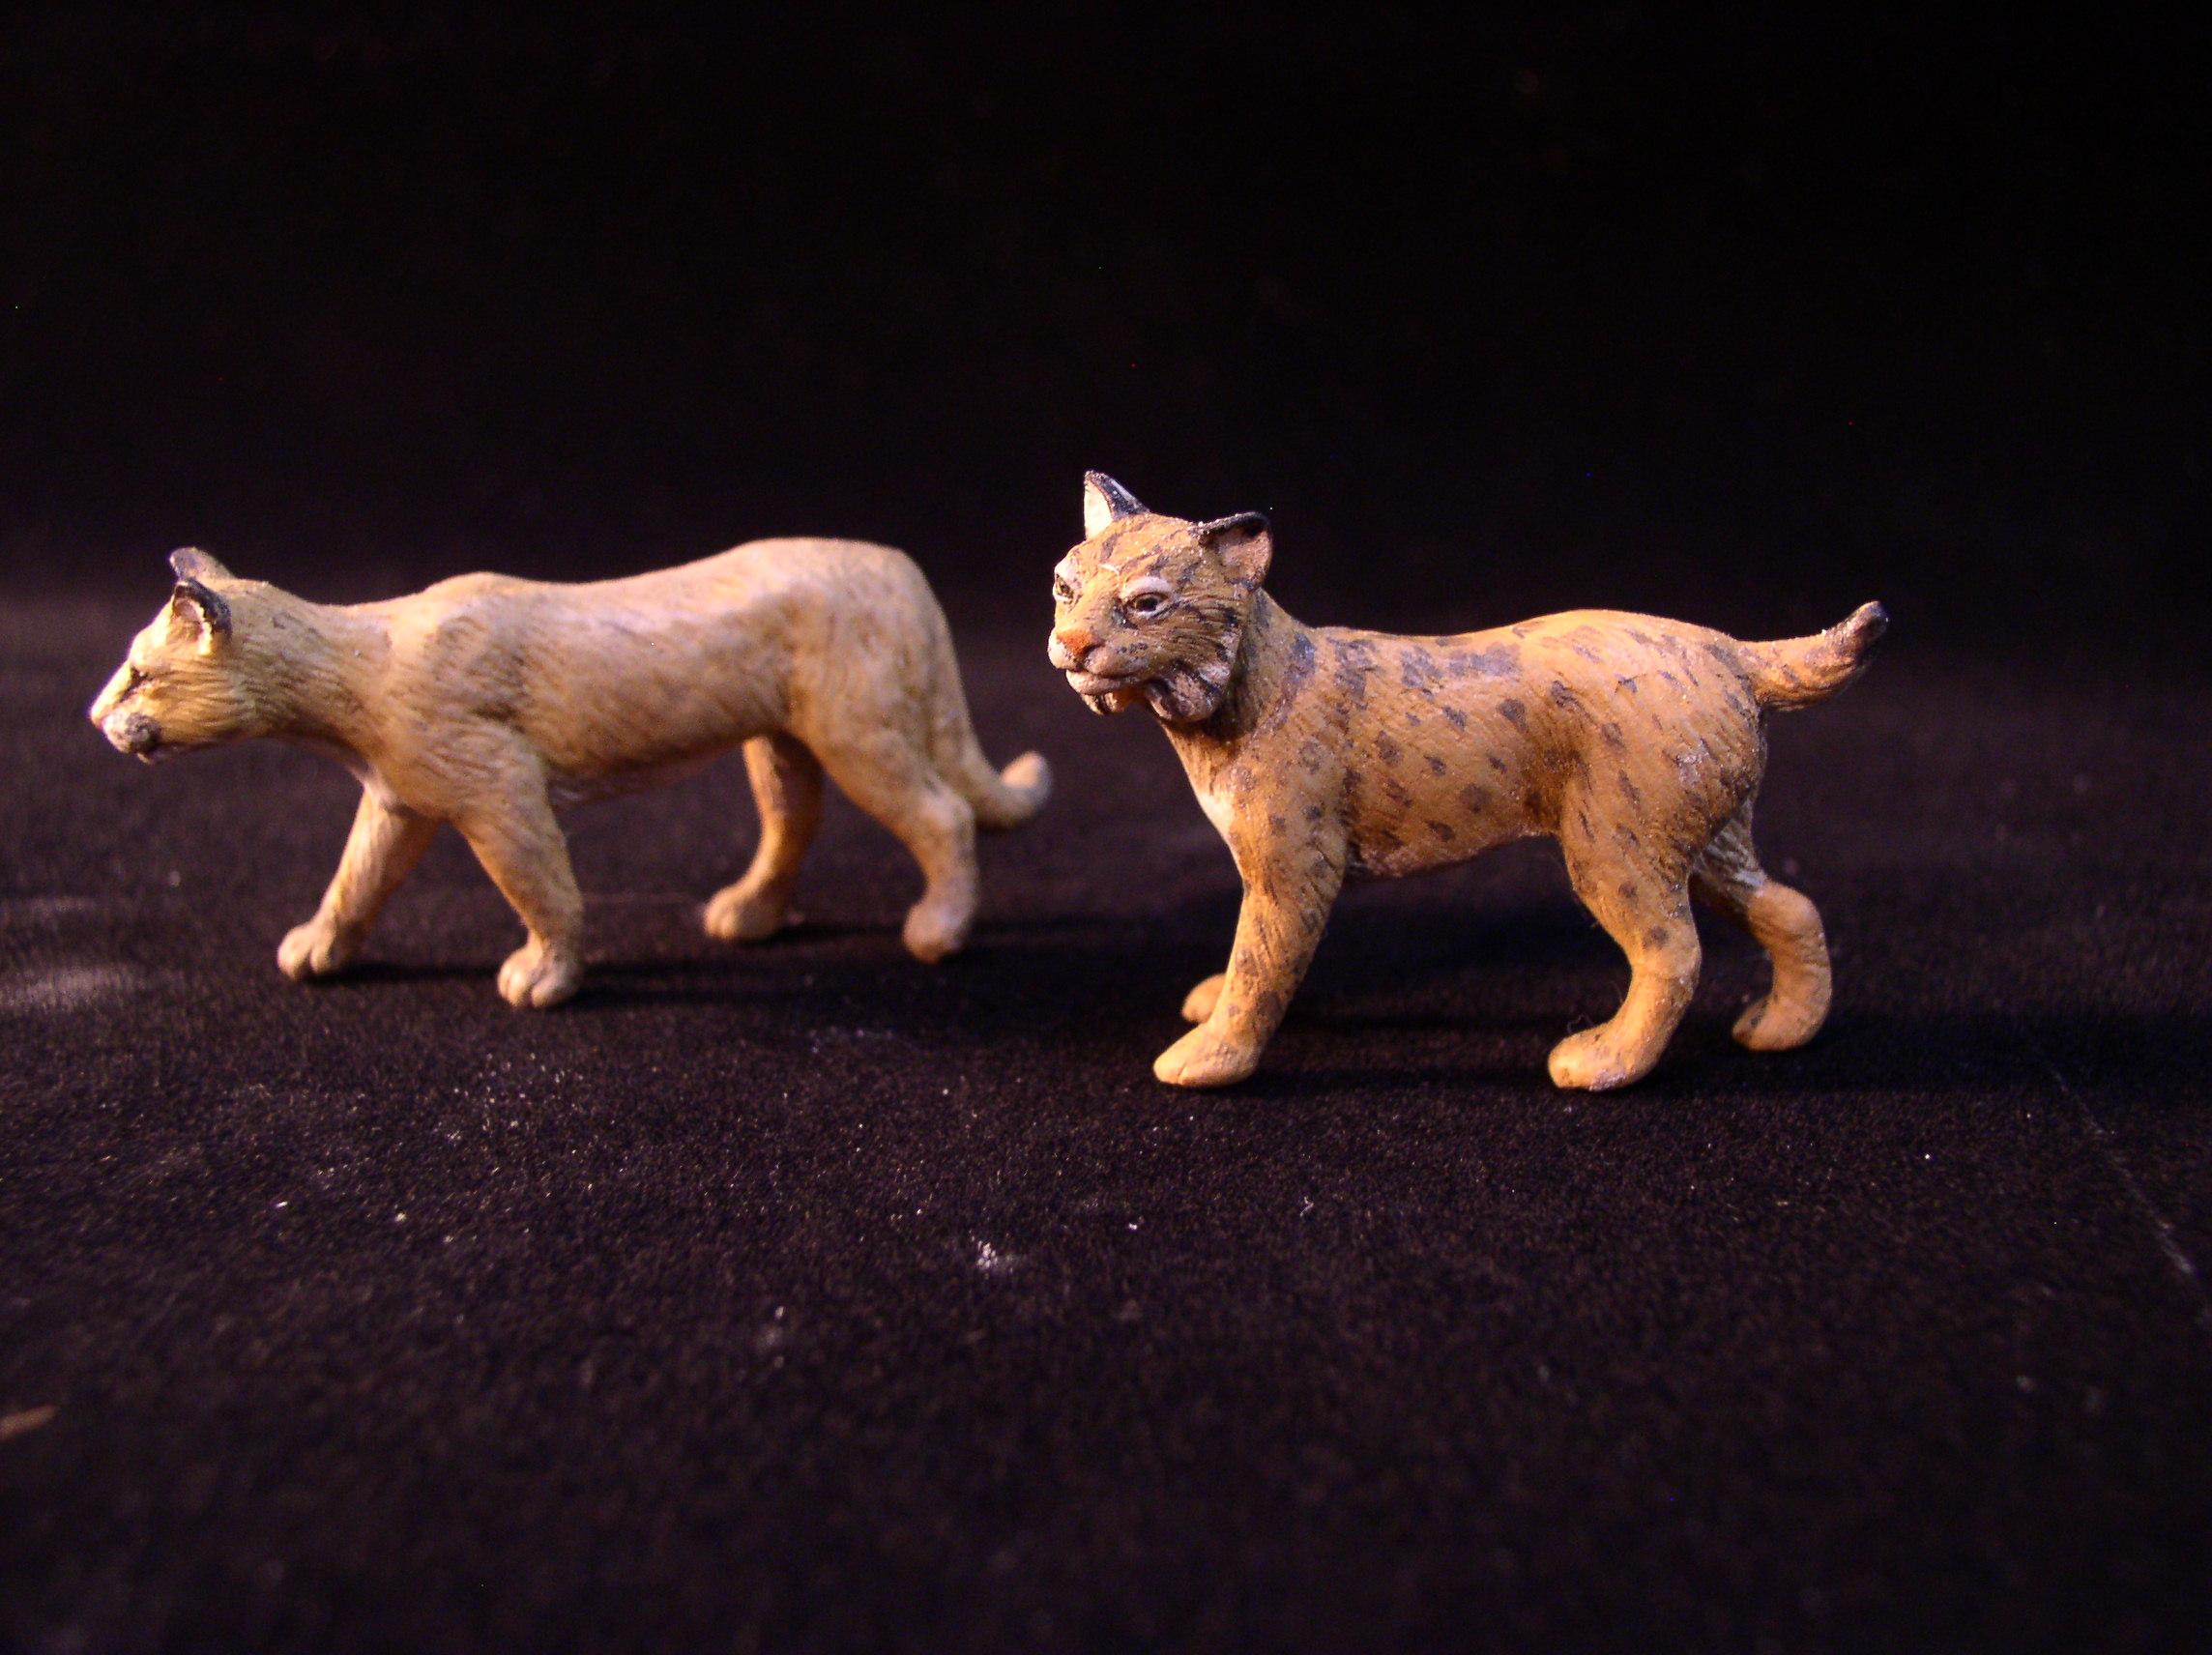 Cougar & lynx toys